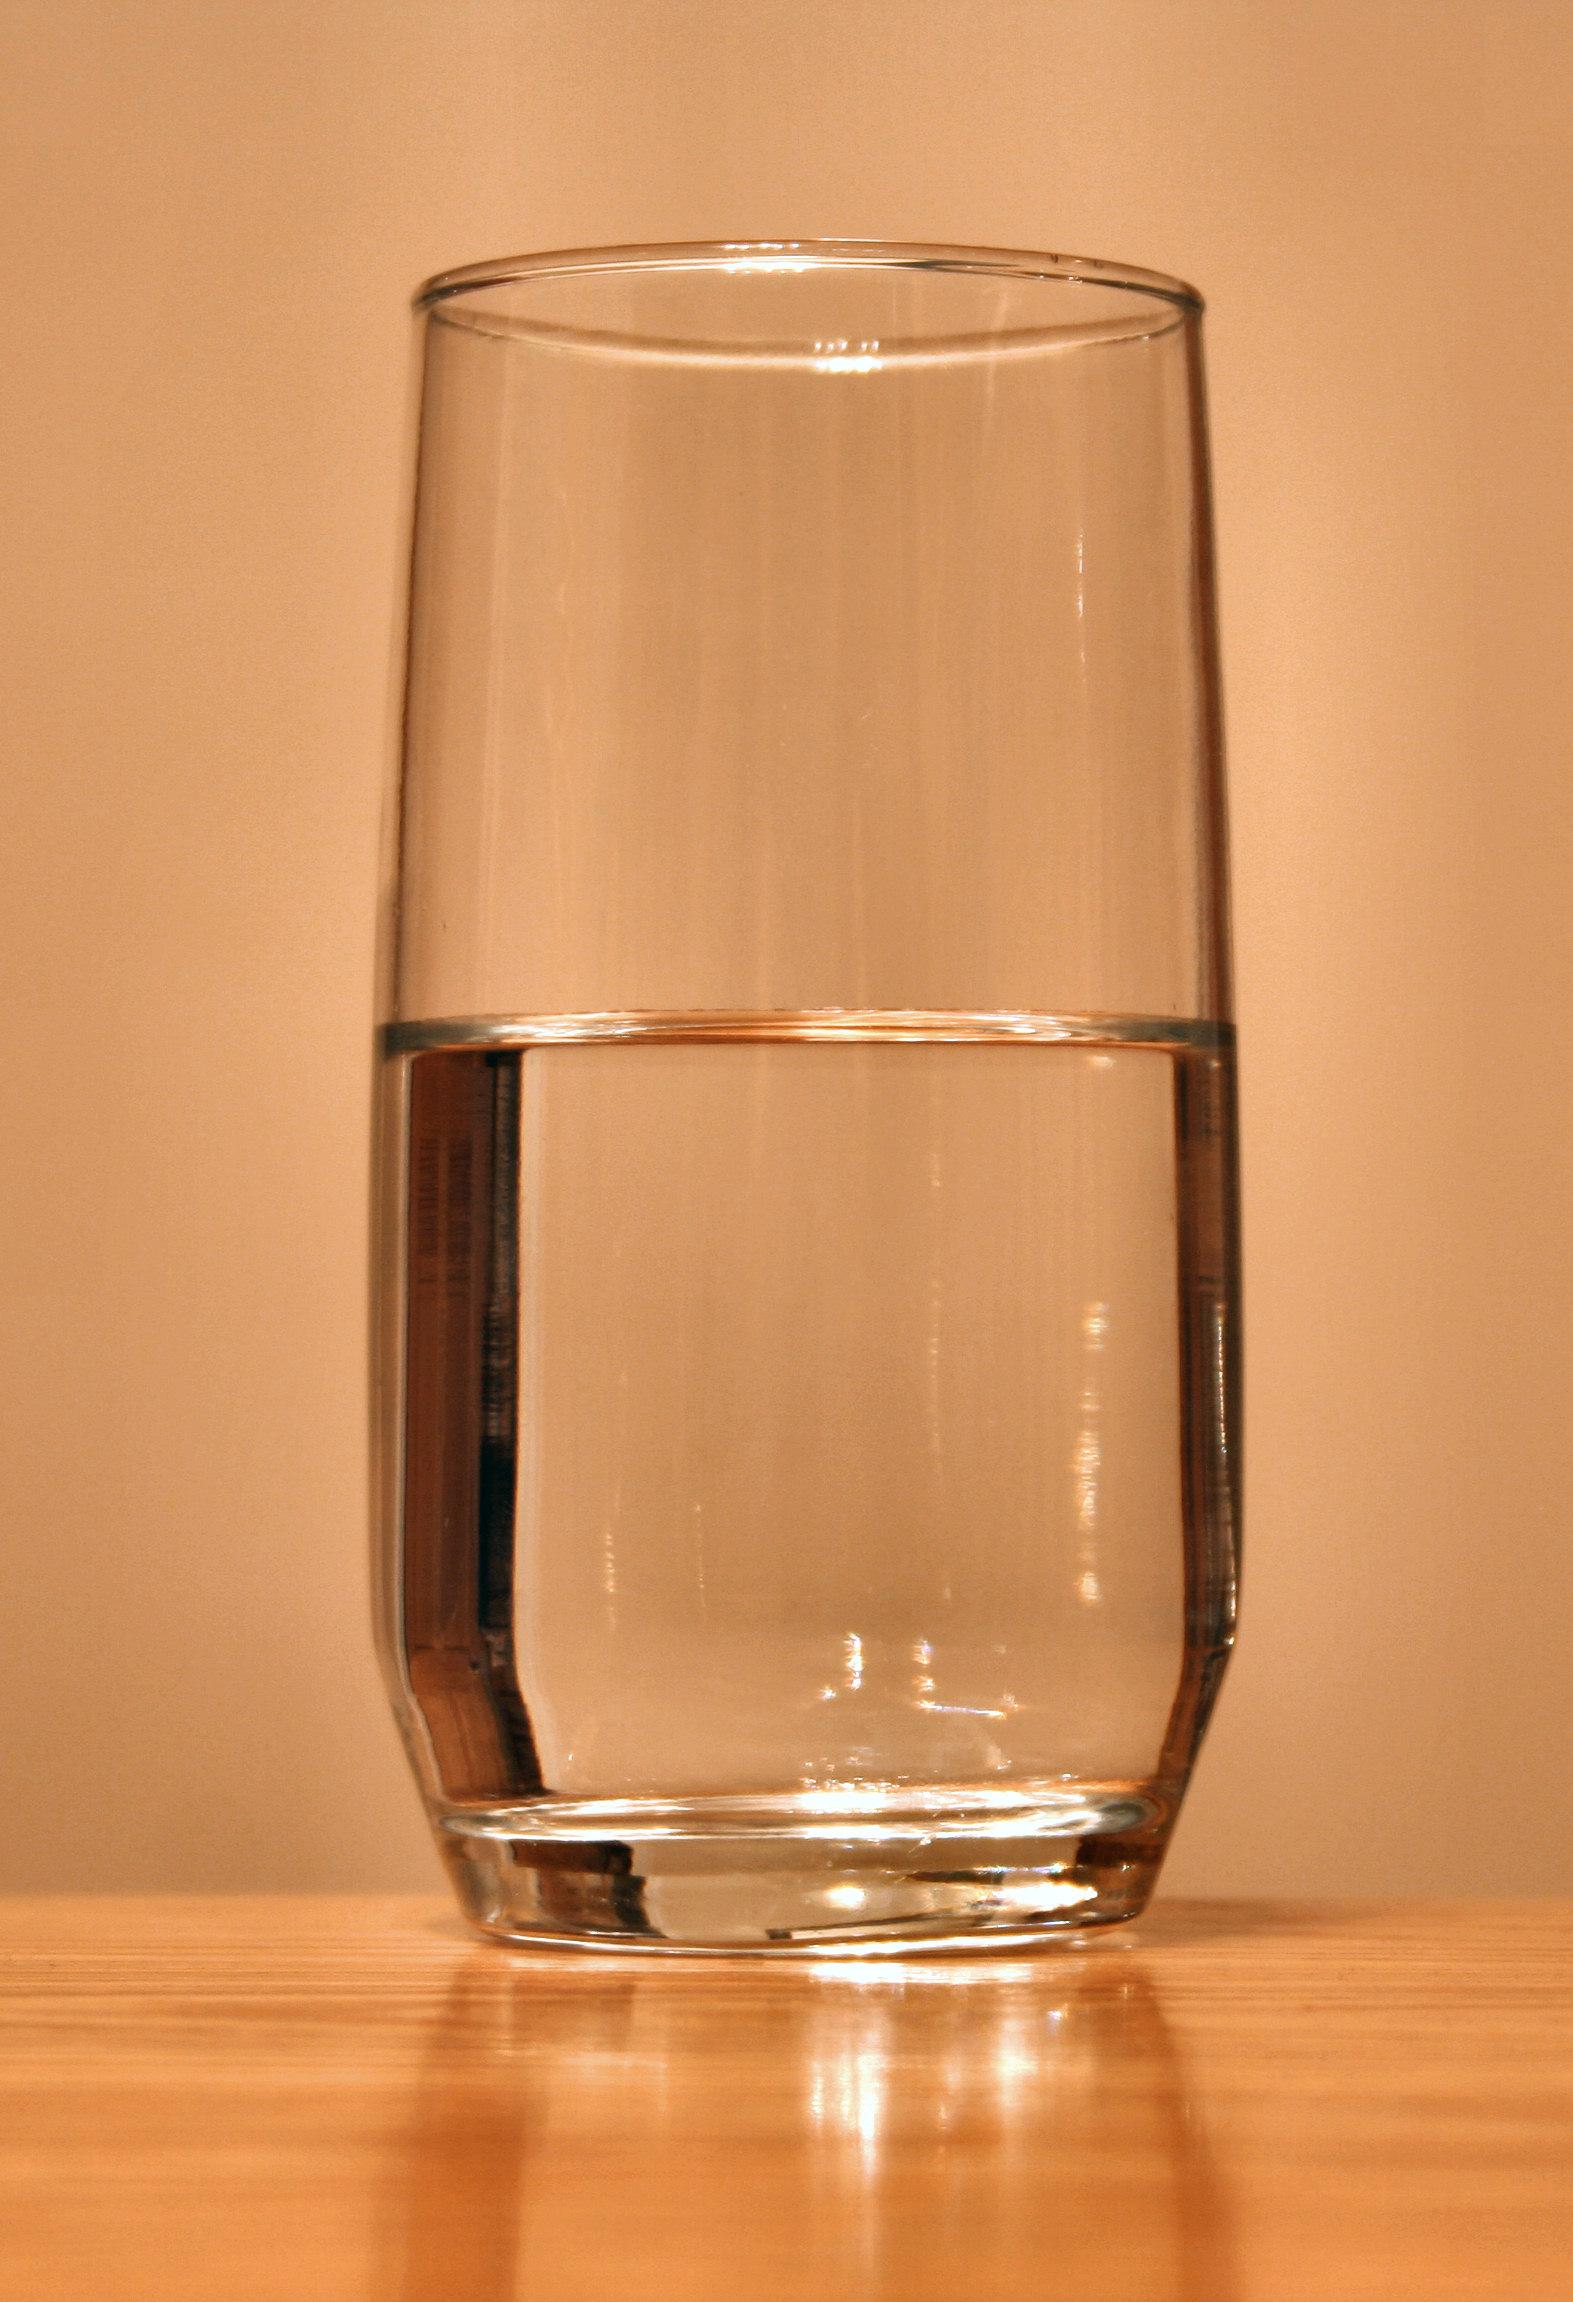 http://images.google.co.uk/url?source=imgres&ct=img&q=http://upload.wikimedia.org/wikipedia/commons/1/11/Glass-of-water.jpg&usg=AFQjCNFOI0Qv3TjM9ohDsbxfQFD_Rp5q-Q